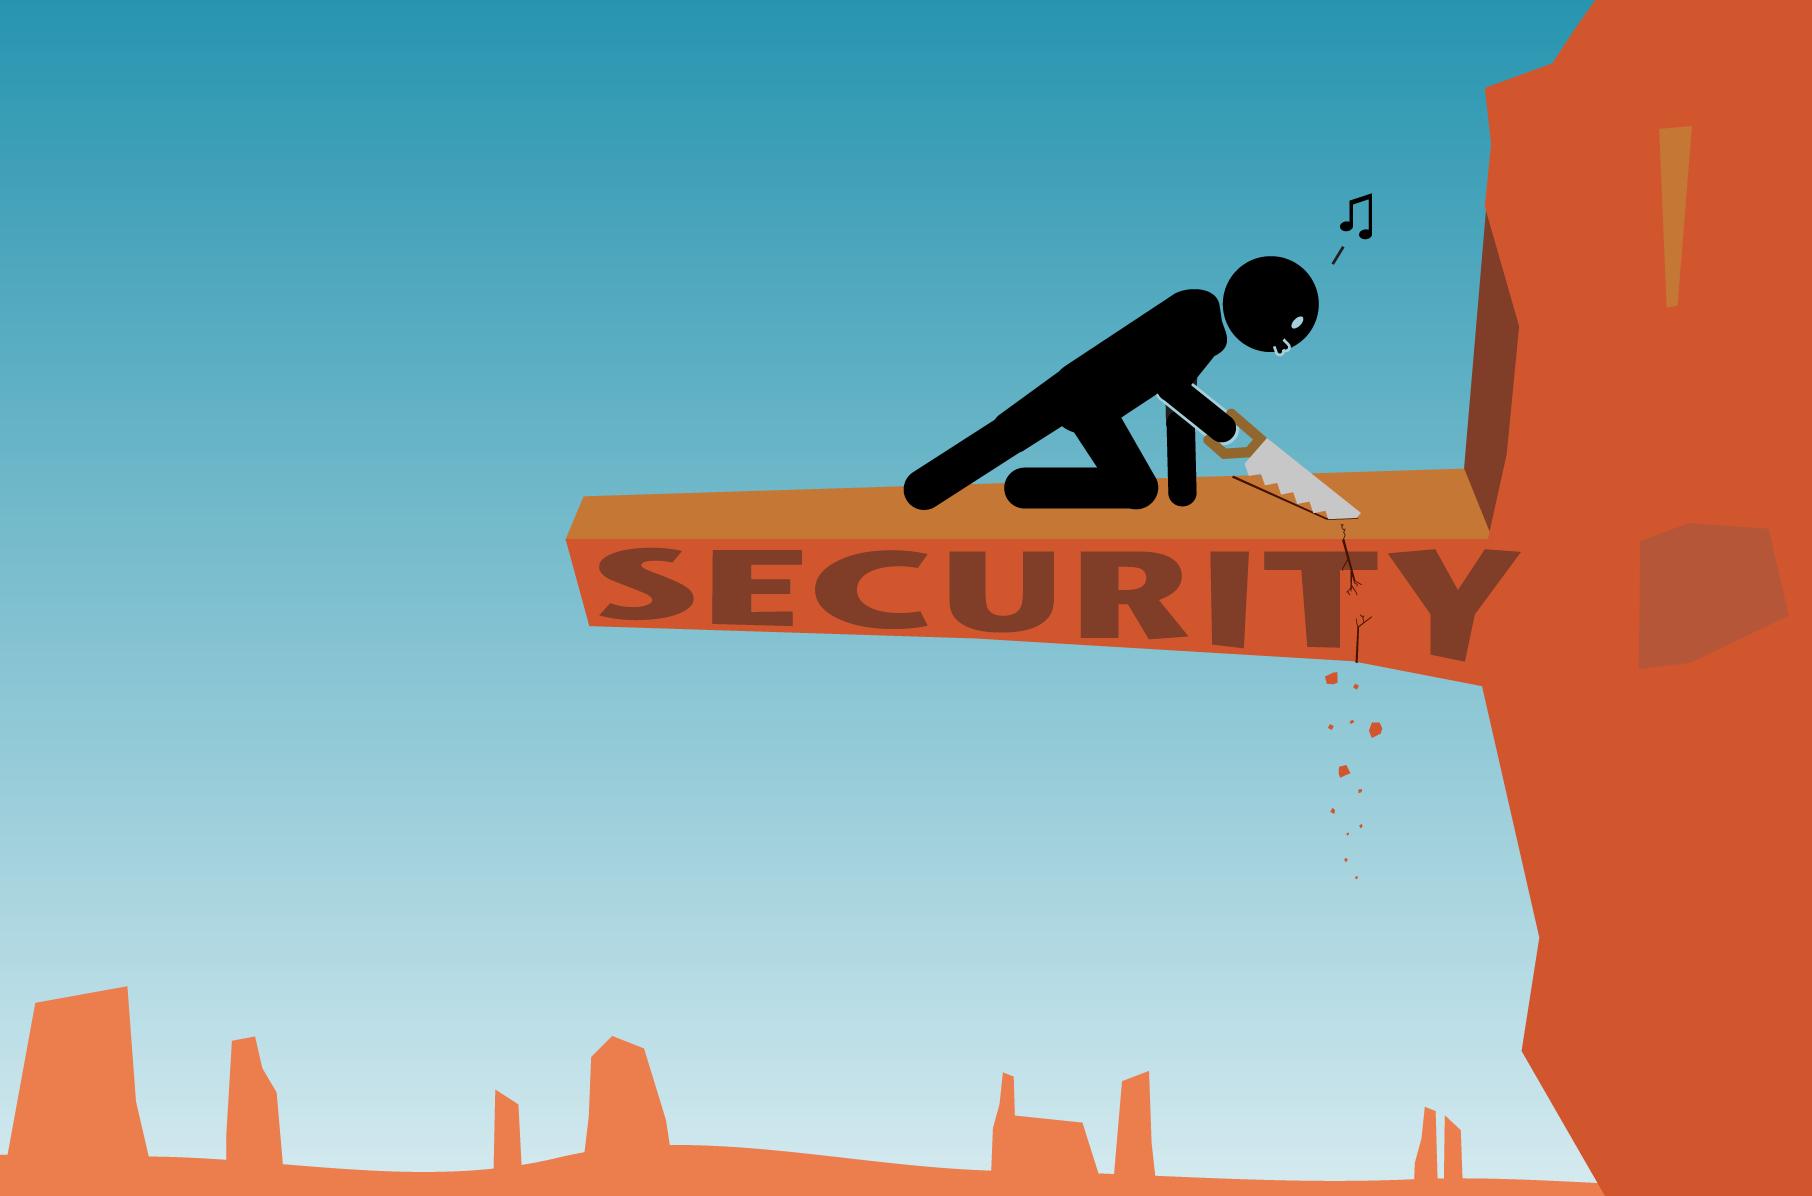 Undermining Security